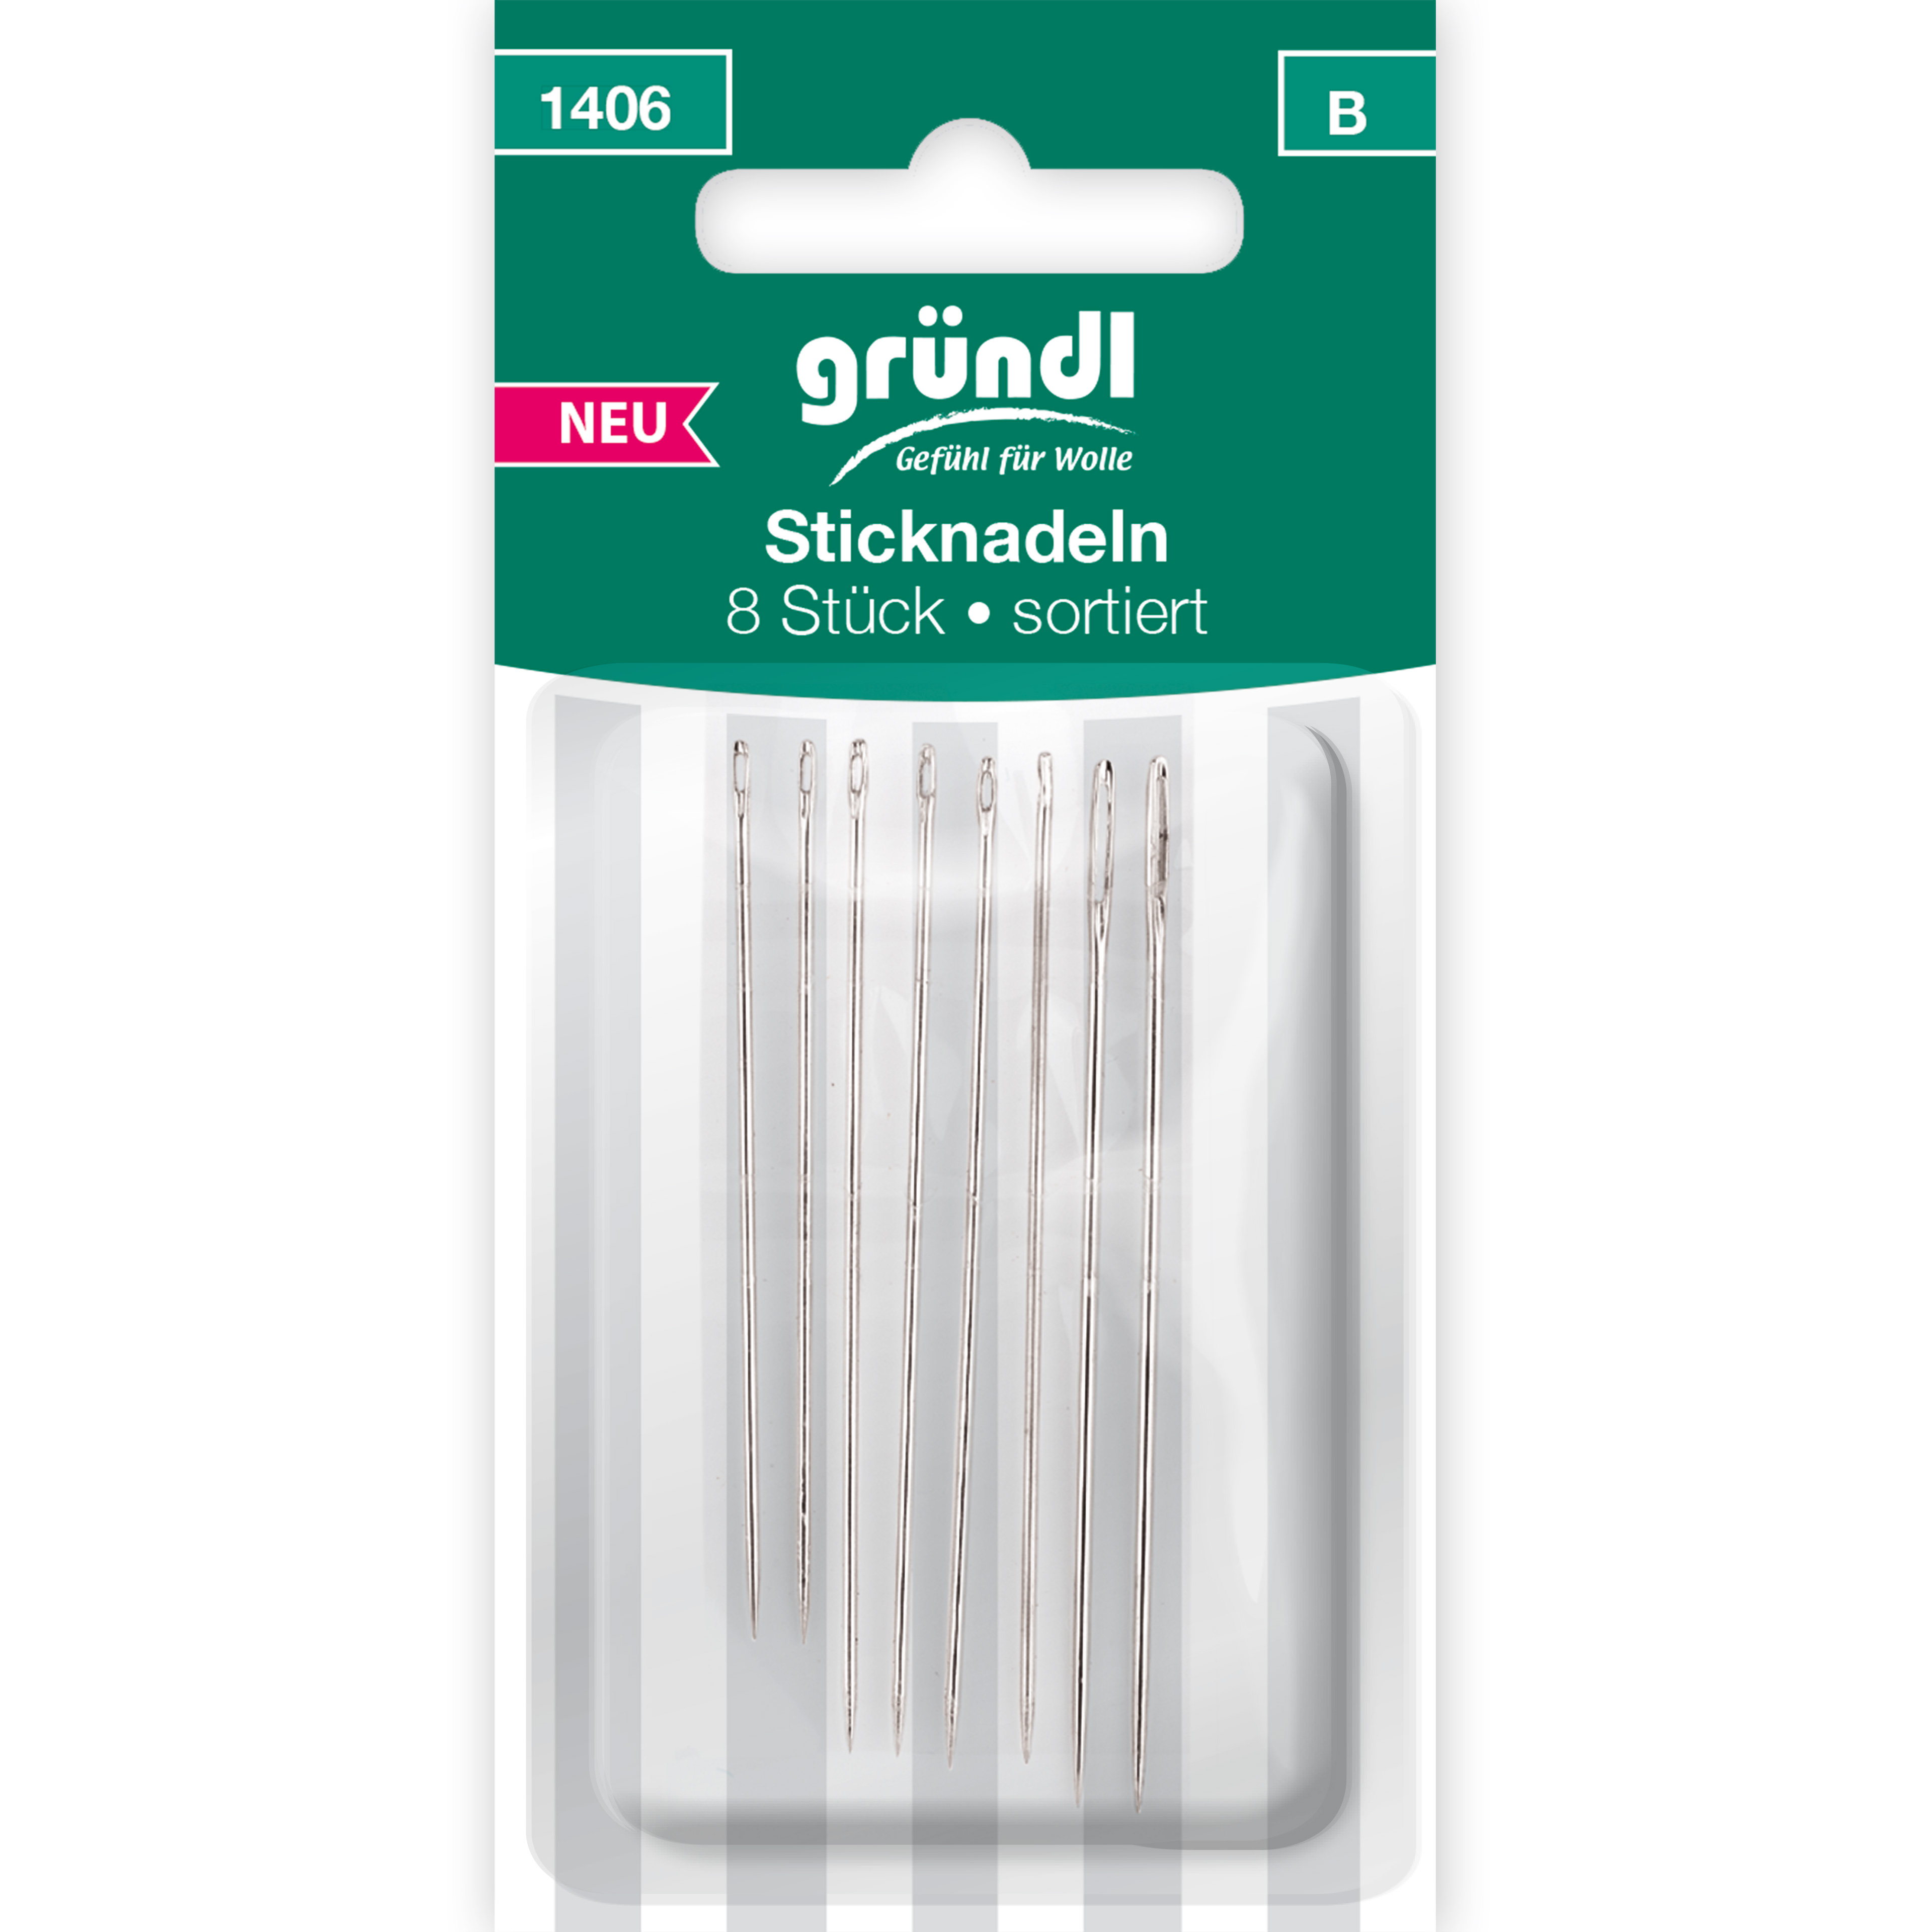 Sticknadeln mit Spitze, 8 Nadeln